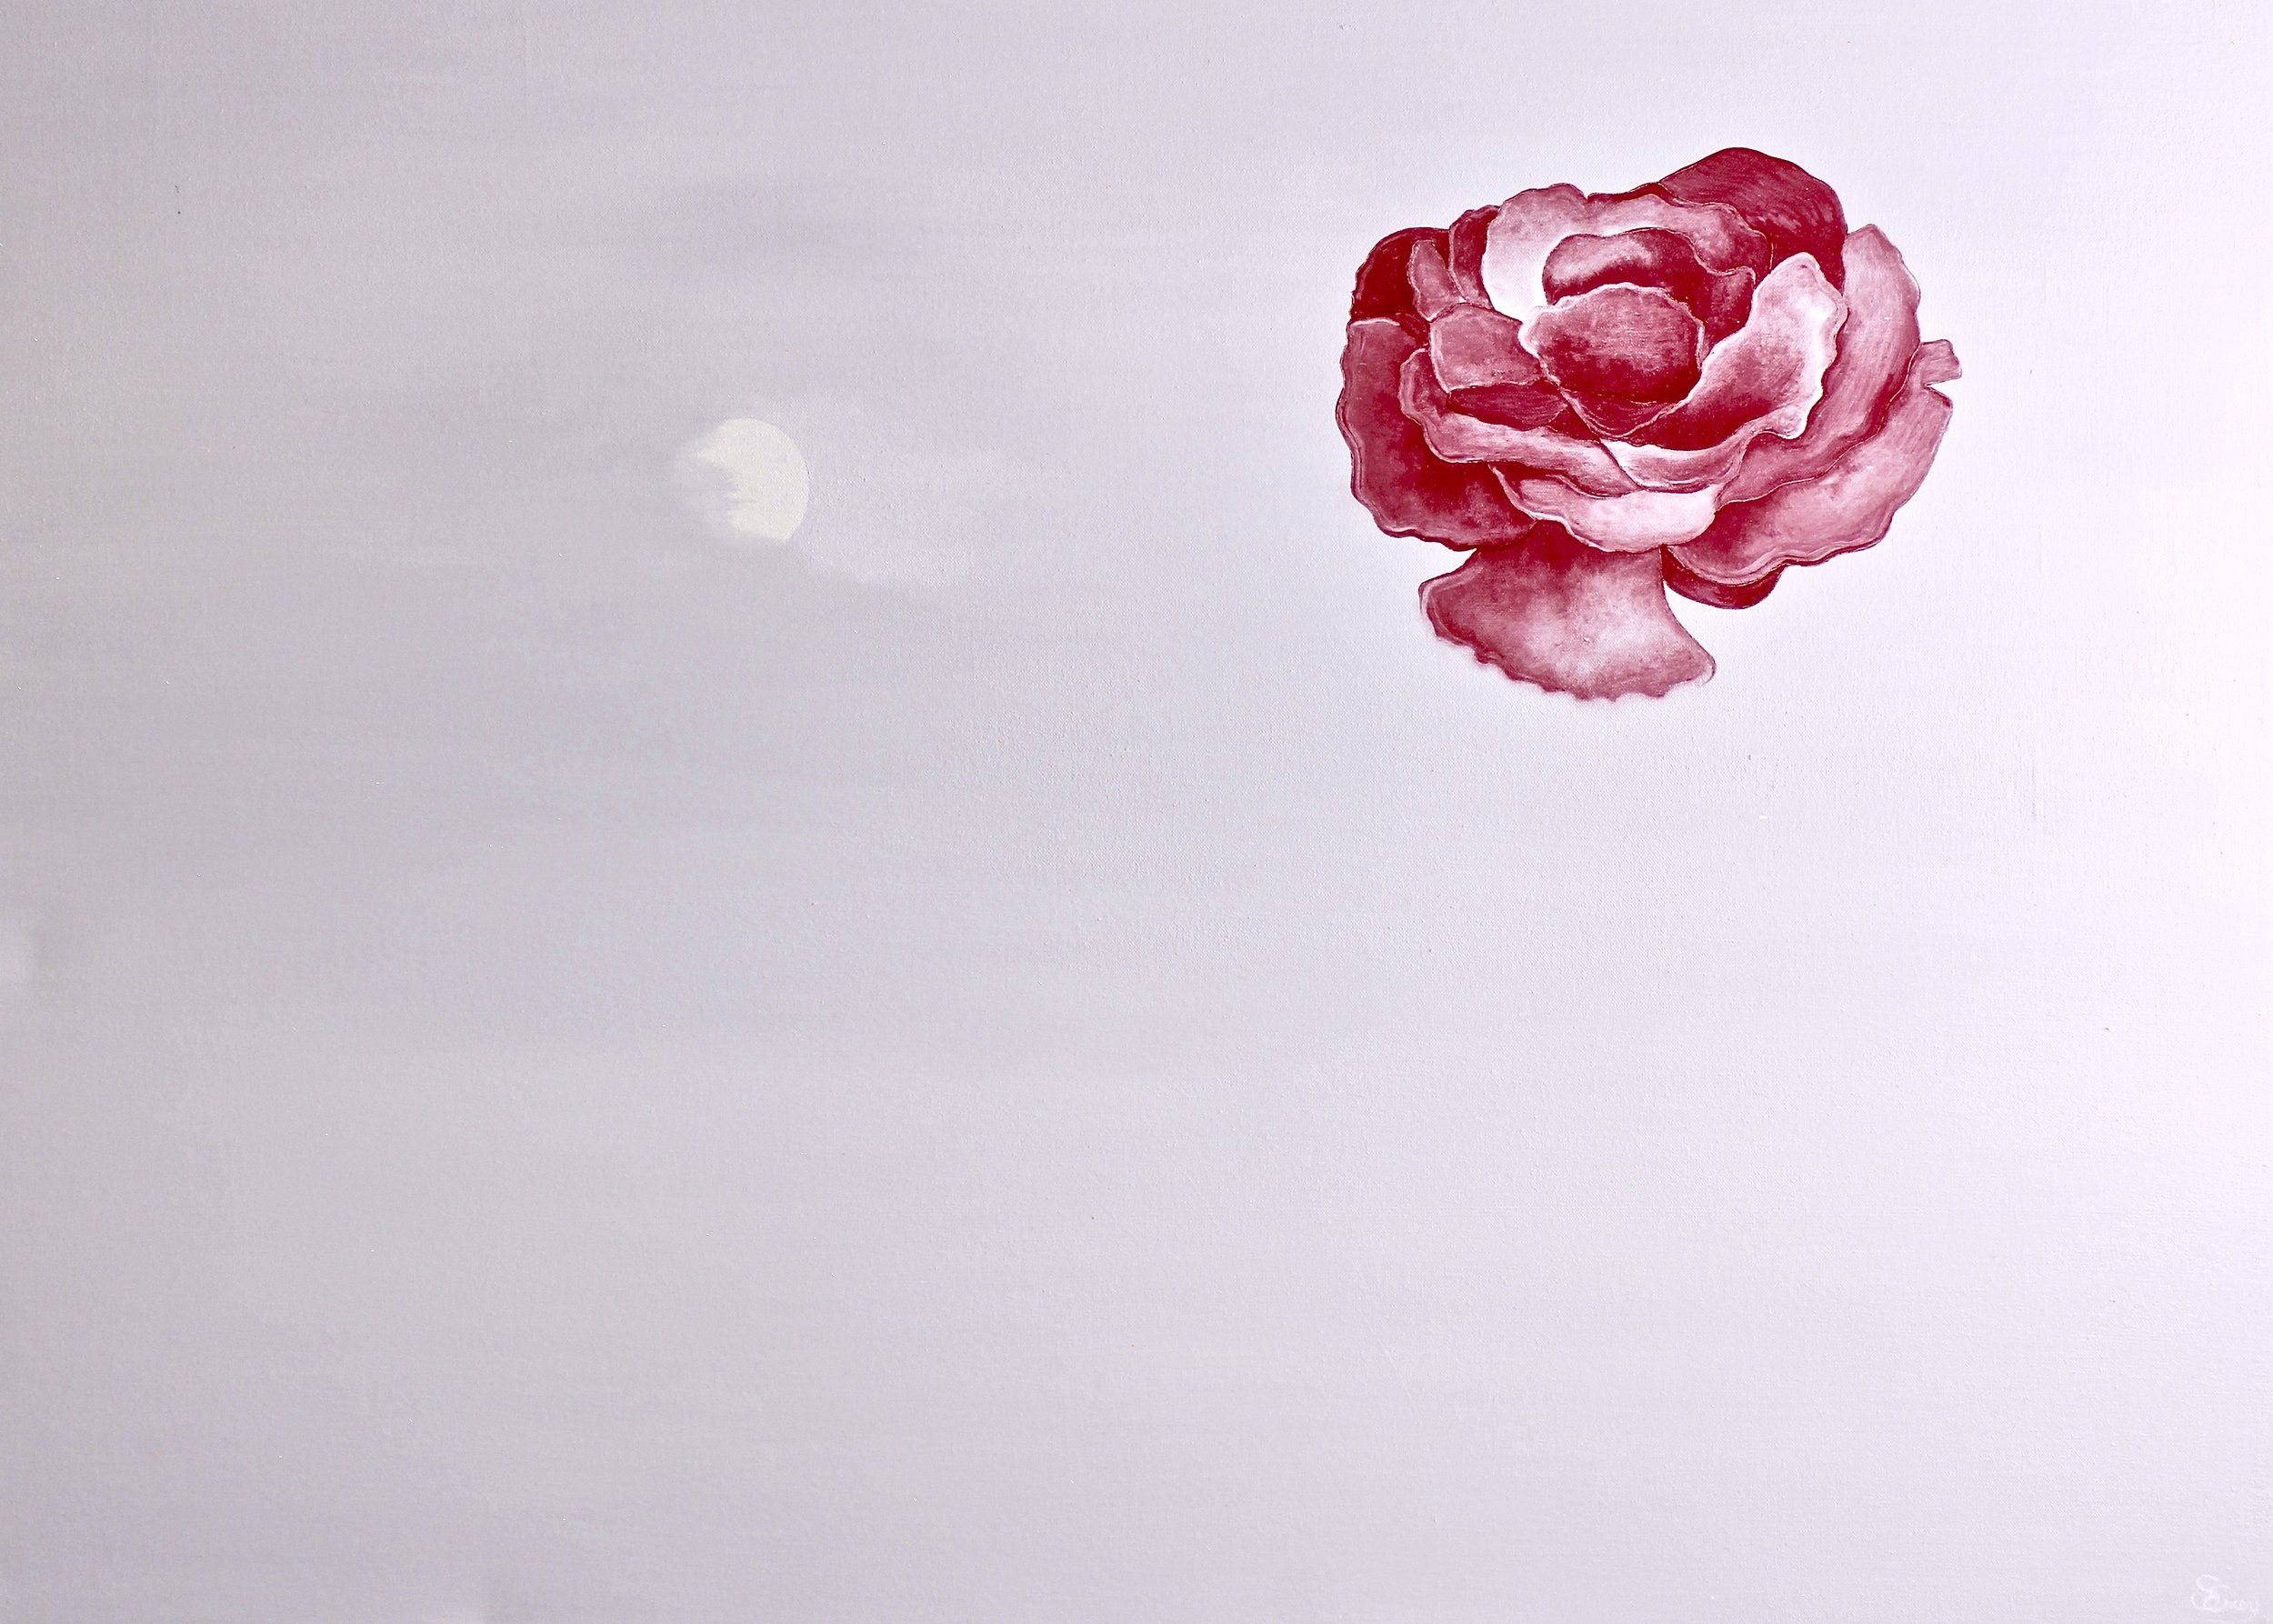 Moon Blossom -  2014 oil on canvas 82cm x 114cm